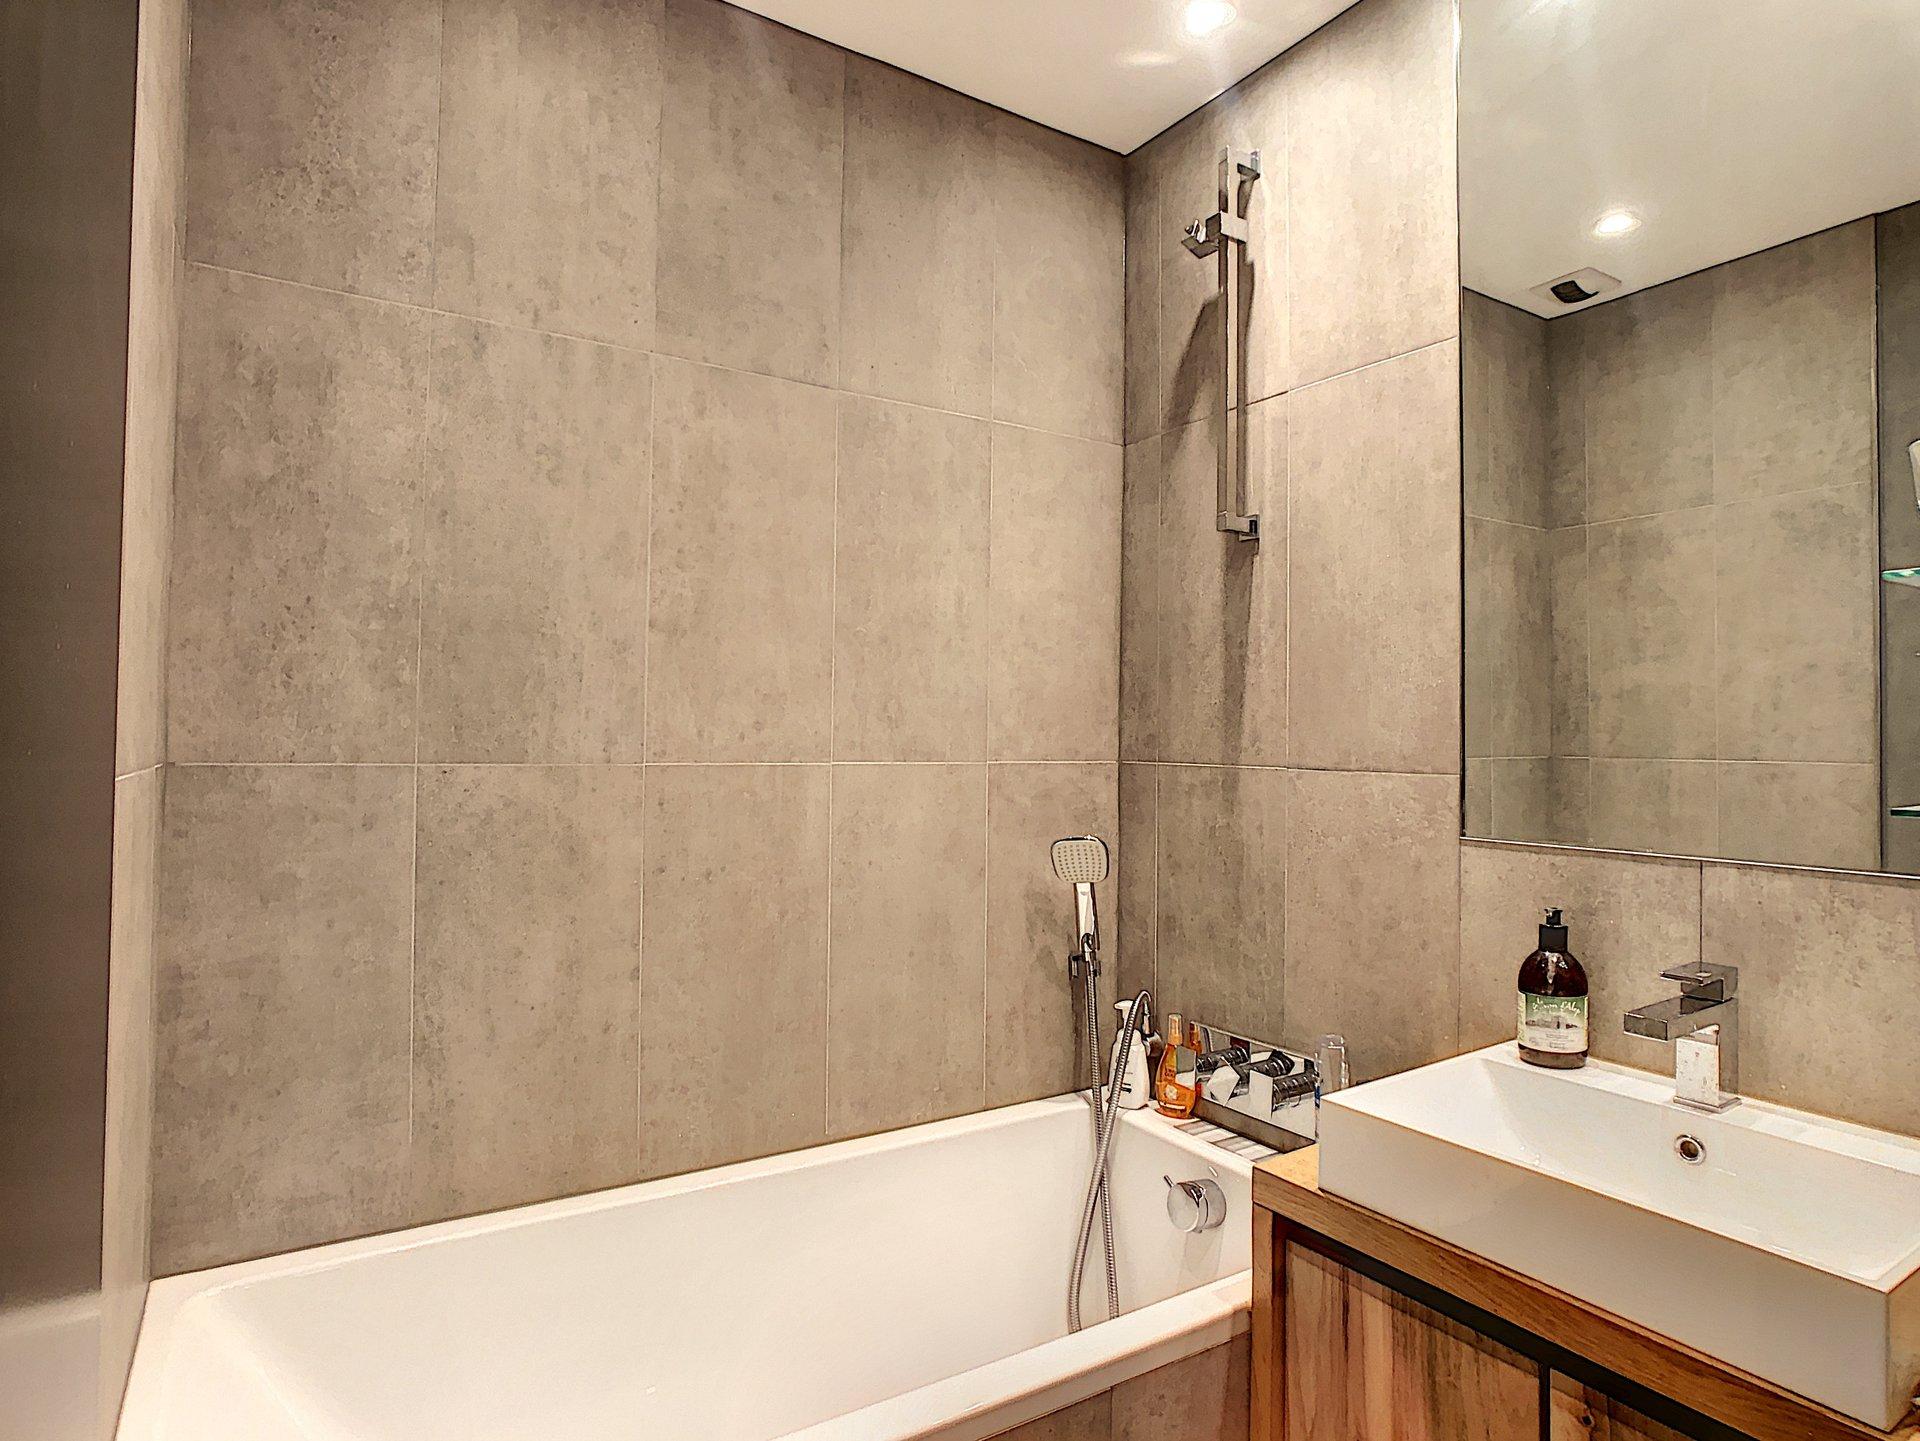 Nice tiled bathroom